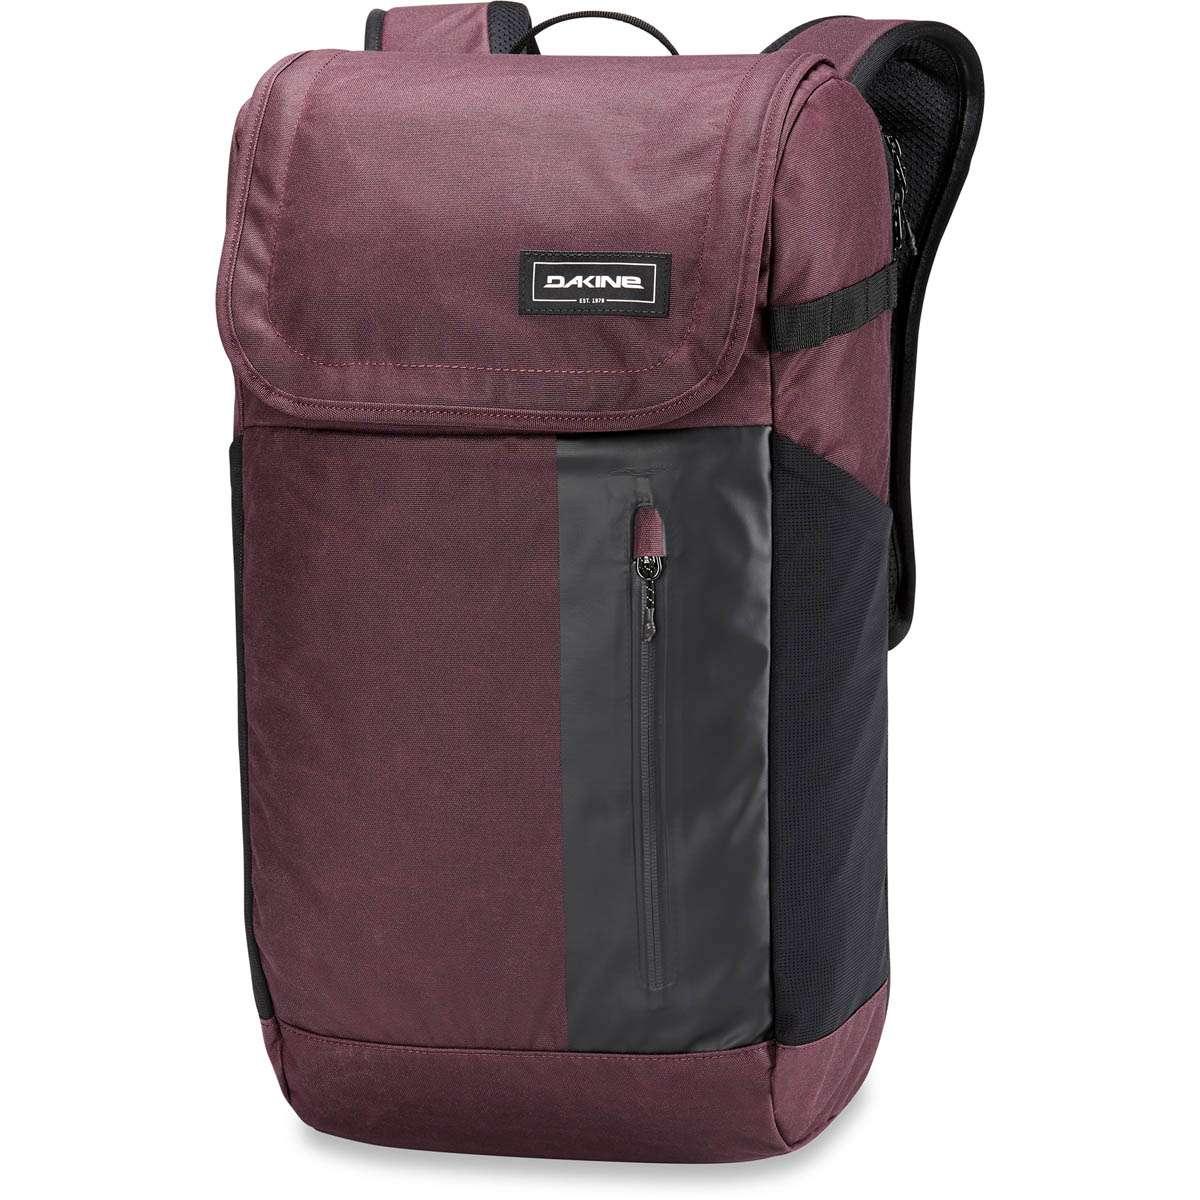 905c69eea86b8 Dakine Concourse 28L Backpack Plum Shadow